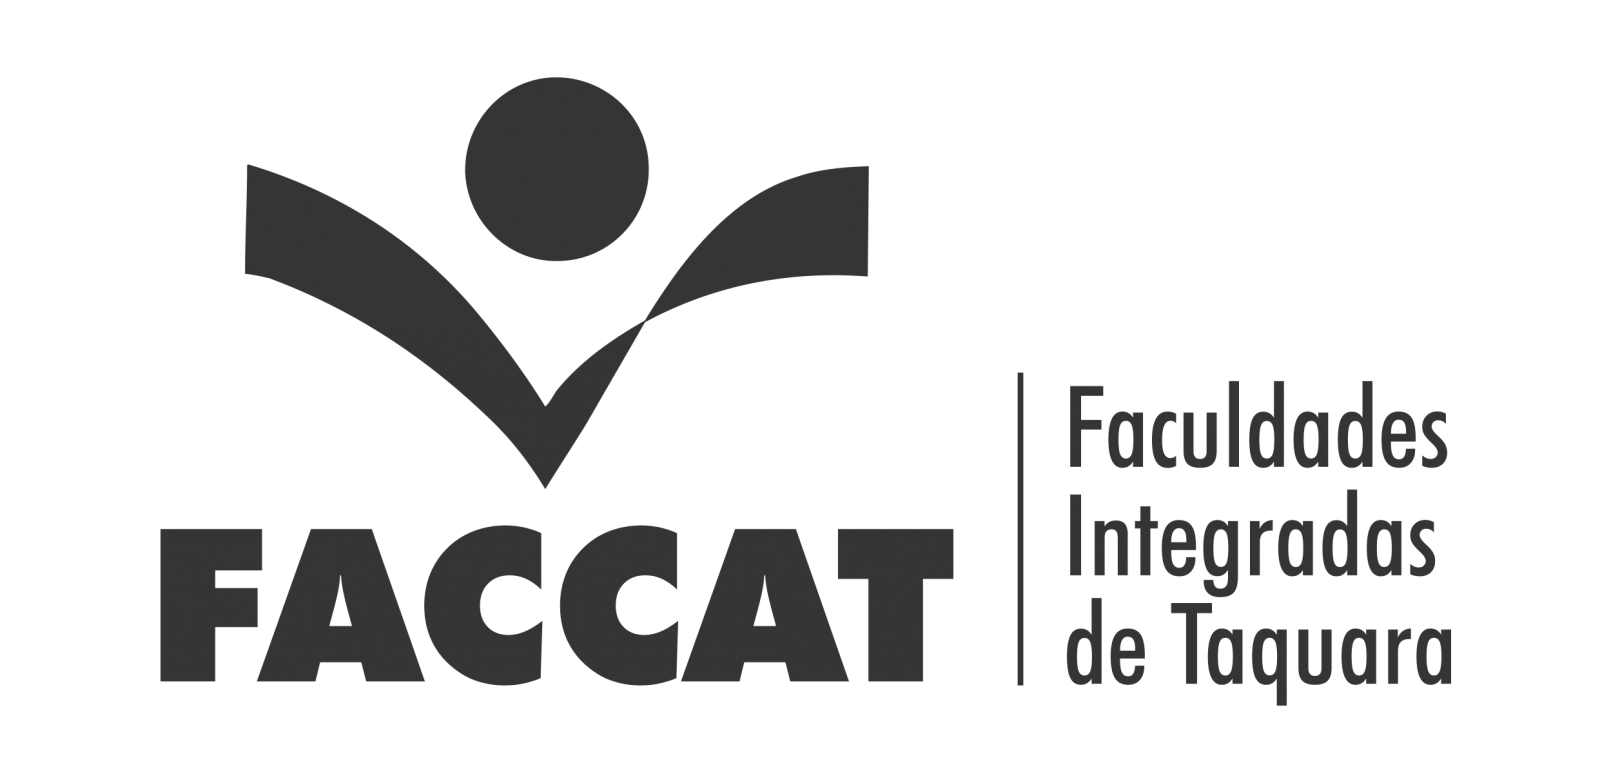 Logo FACCAT com integradas PeB.png